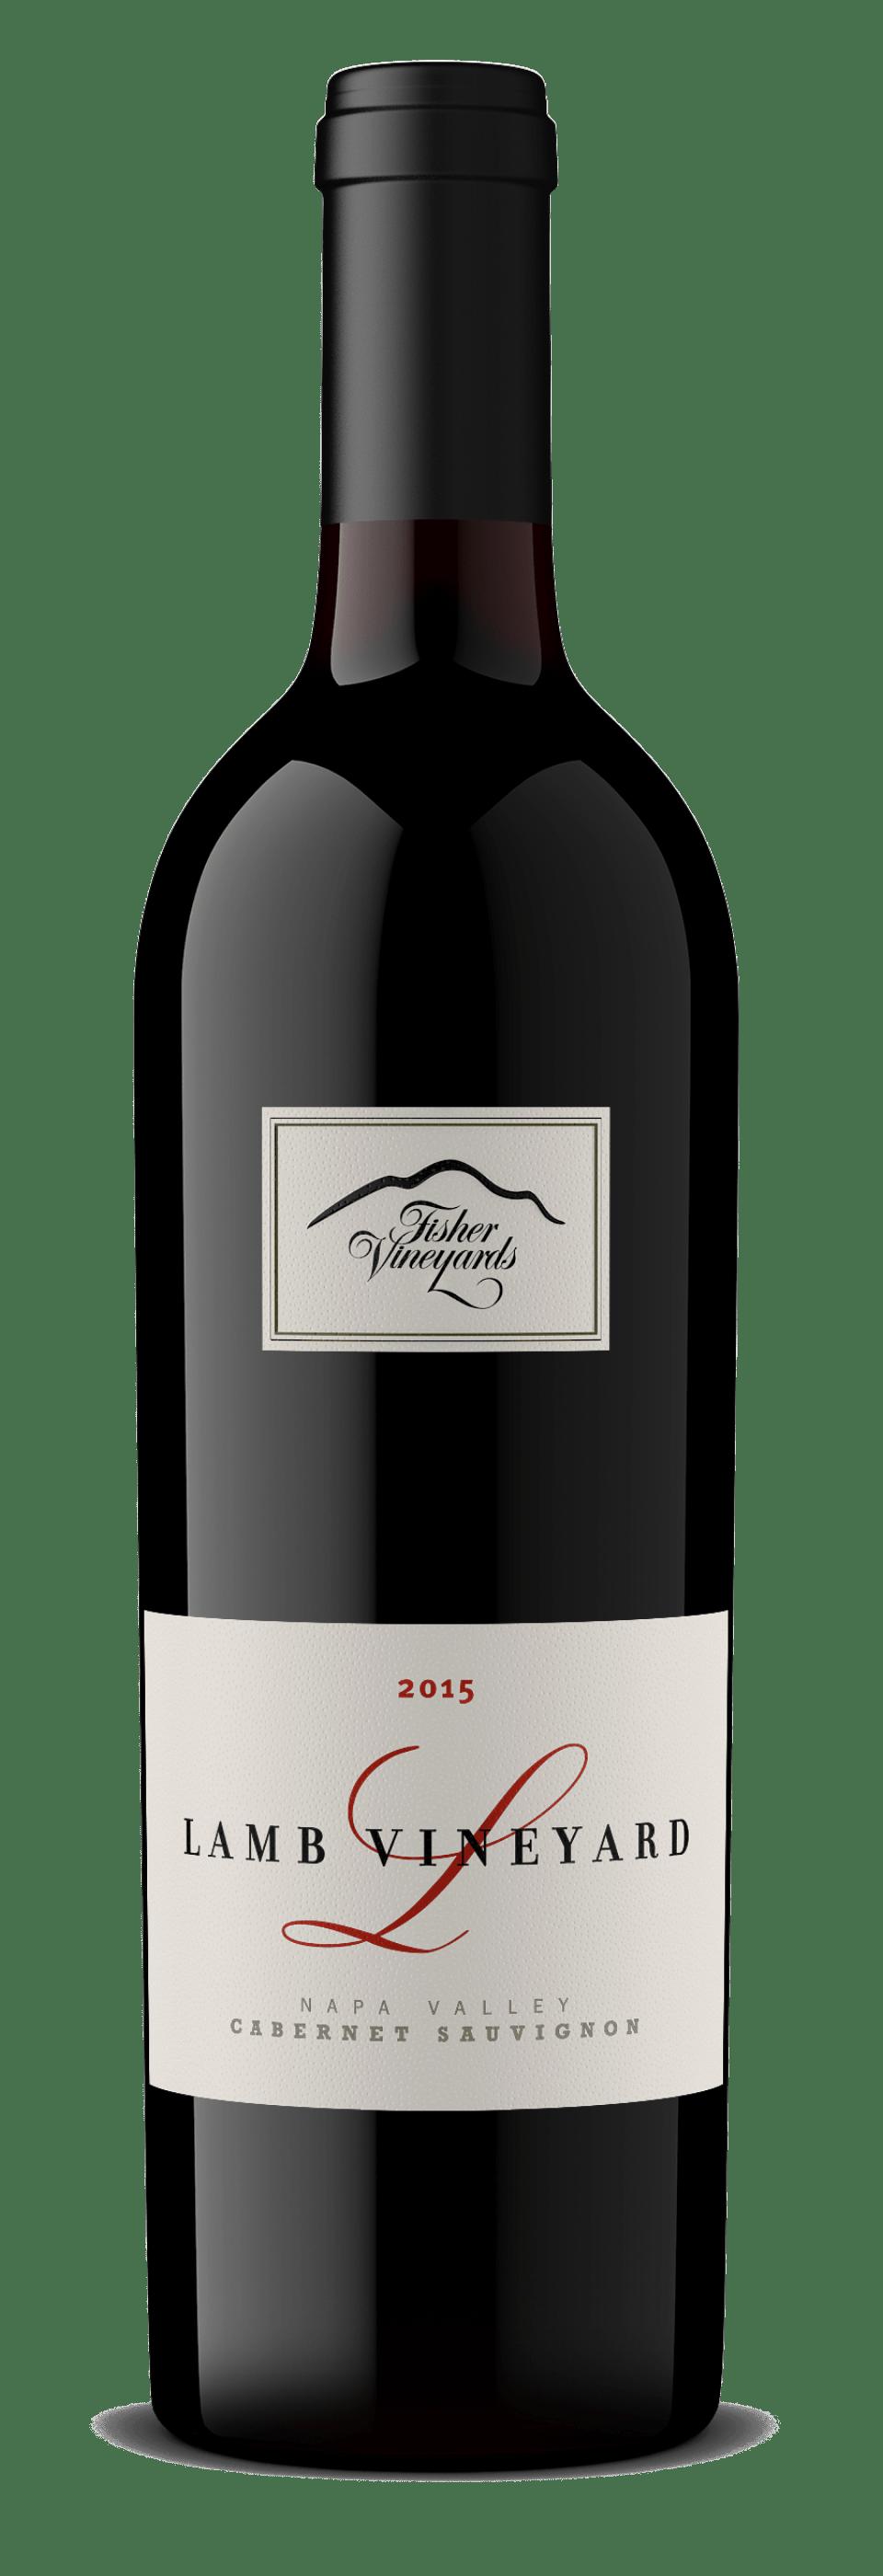 2015 Lamb Vineyard